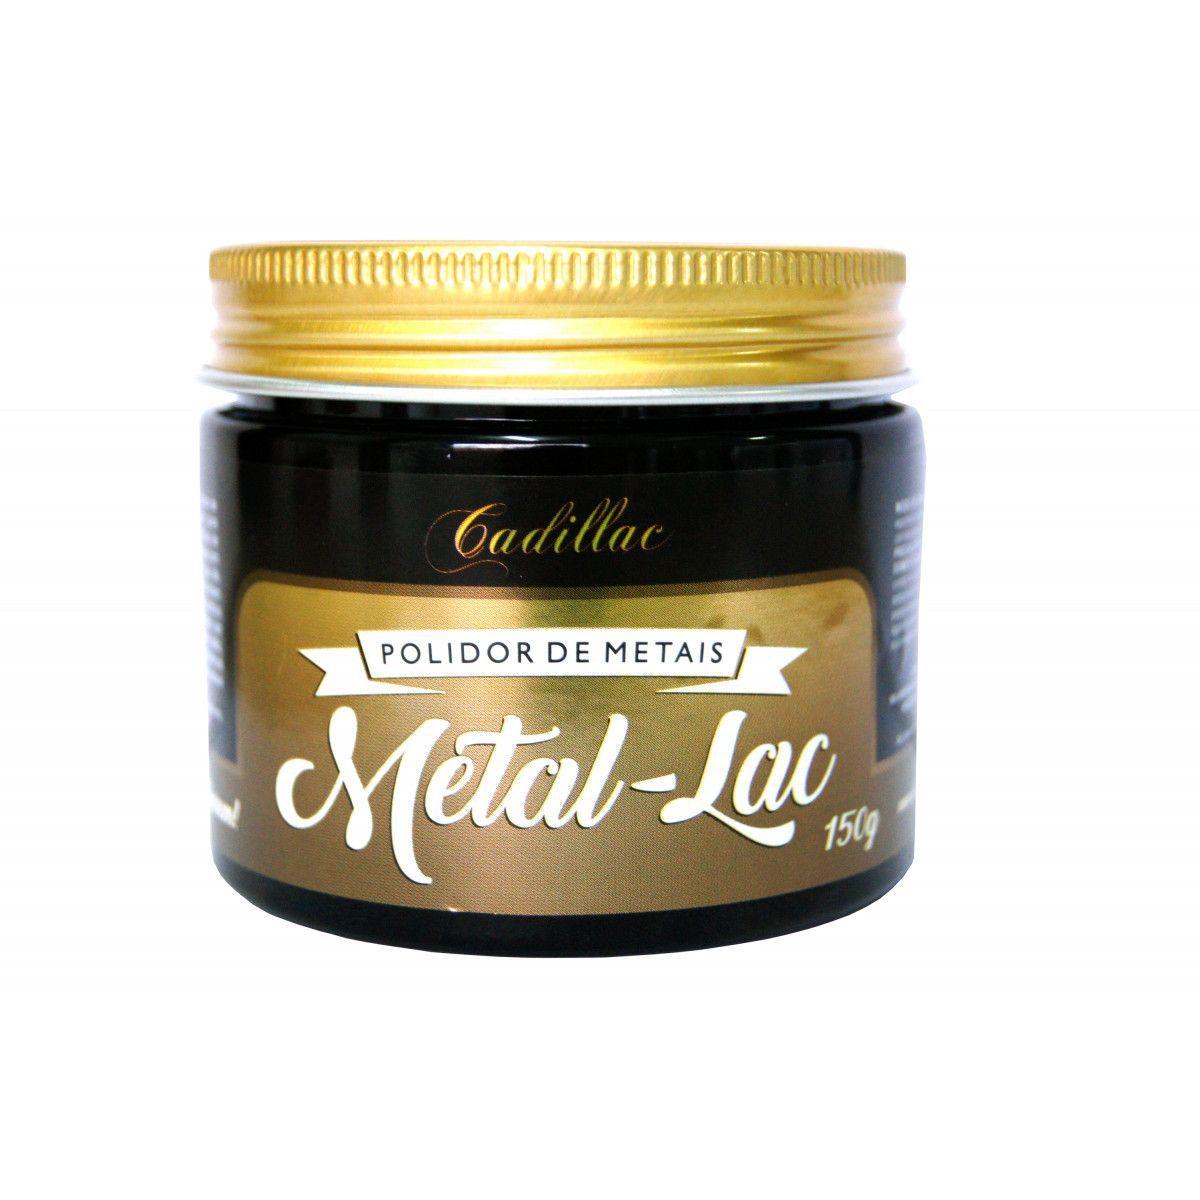 Cadillac Metal-Lac Polidor de Metais 150g  - Loja Go Eco Wash